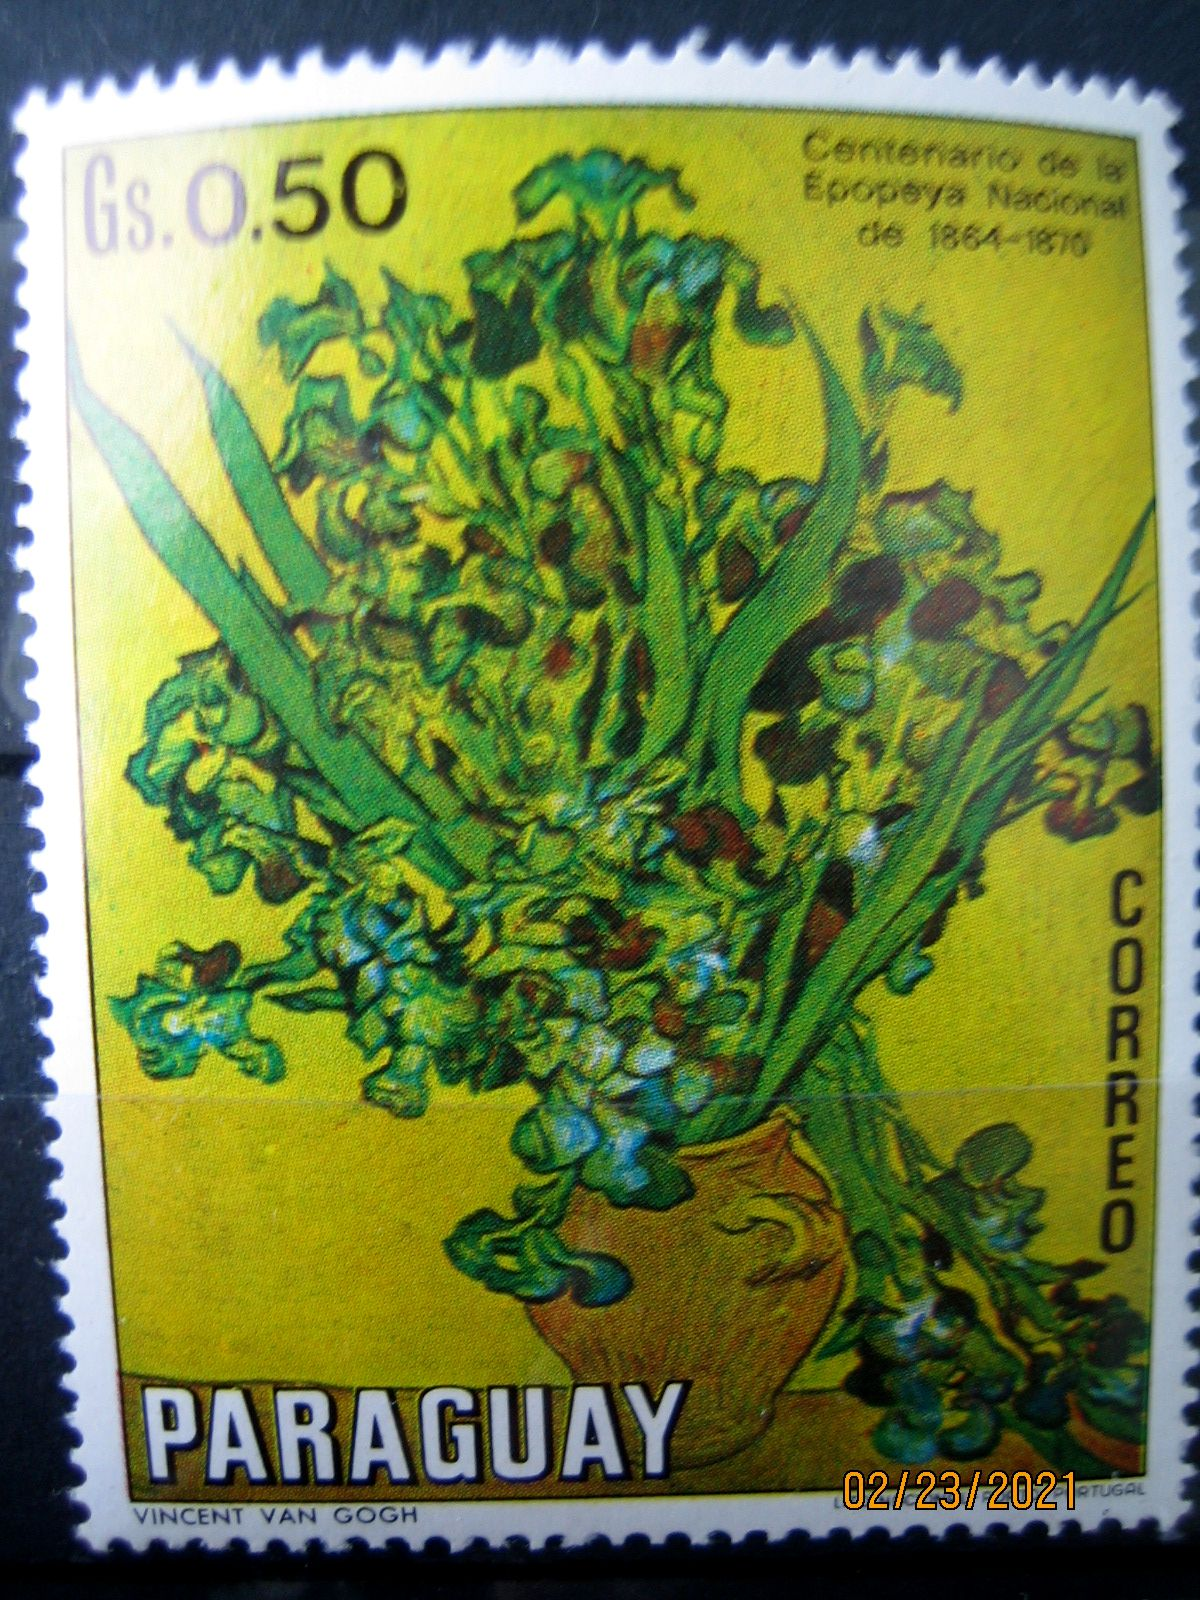 Марка Парагвай, 1970 г. Флора, 100-летие национального эпоса 1864-1870, на марке представлена Цветочная композиция Ван Гога; Mi:PY 2097, Sn:PY 1300, Yt:PY 1094, номинал — 0.50 Gs (гурани)